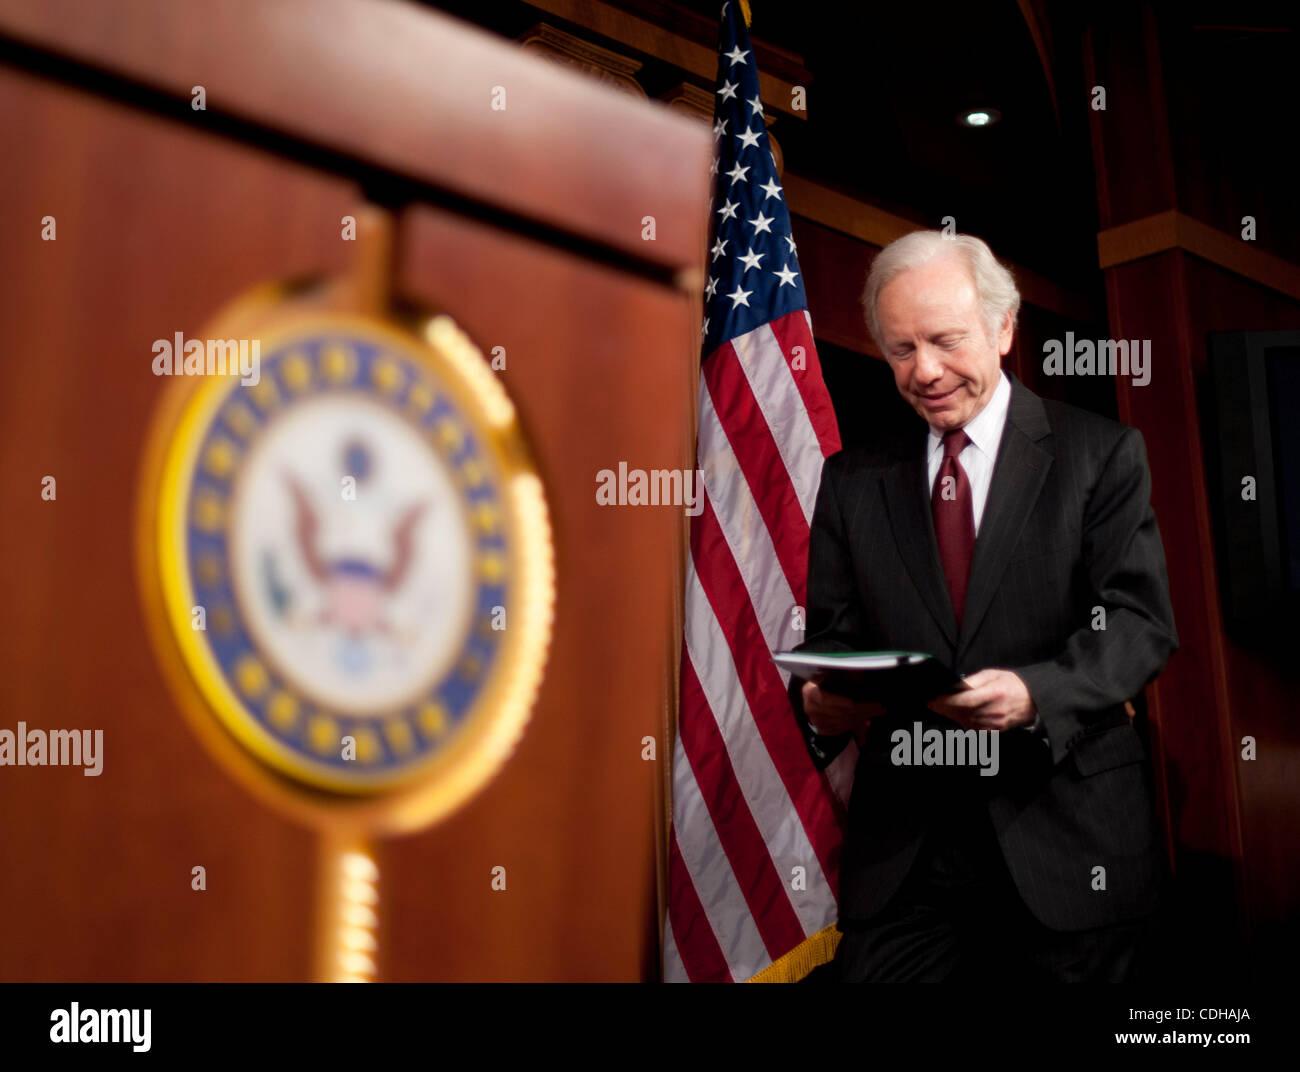 Feb 1, 2011 - Washington, District of Columbia, U.S. - Senate Homeland Security and Governmental Affairs Chairman Stock Photo